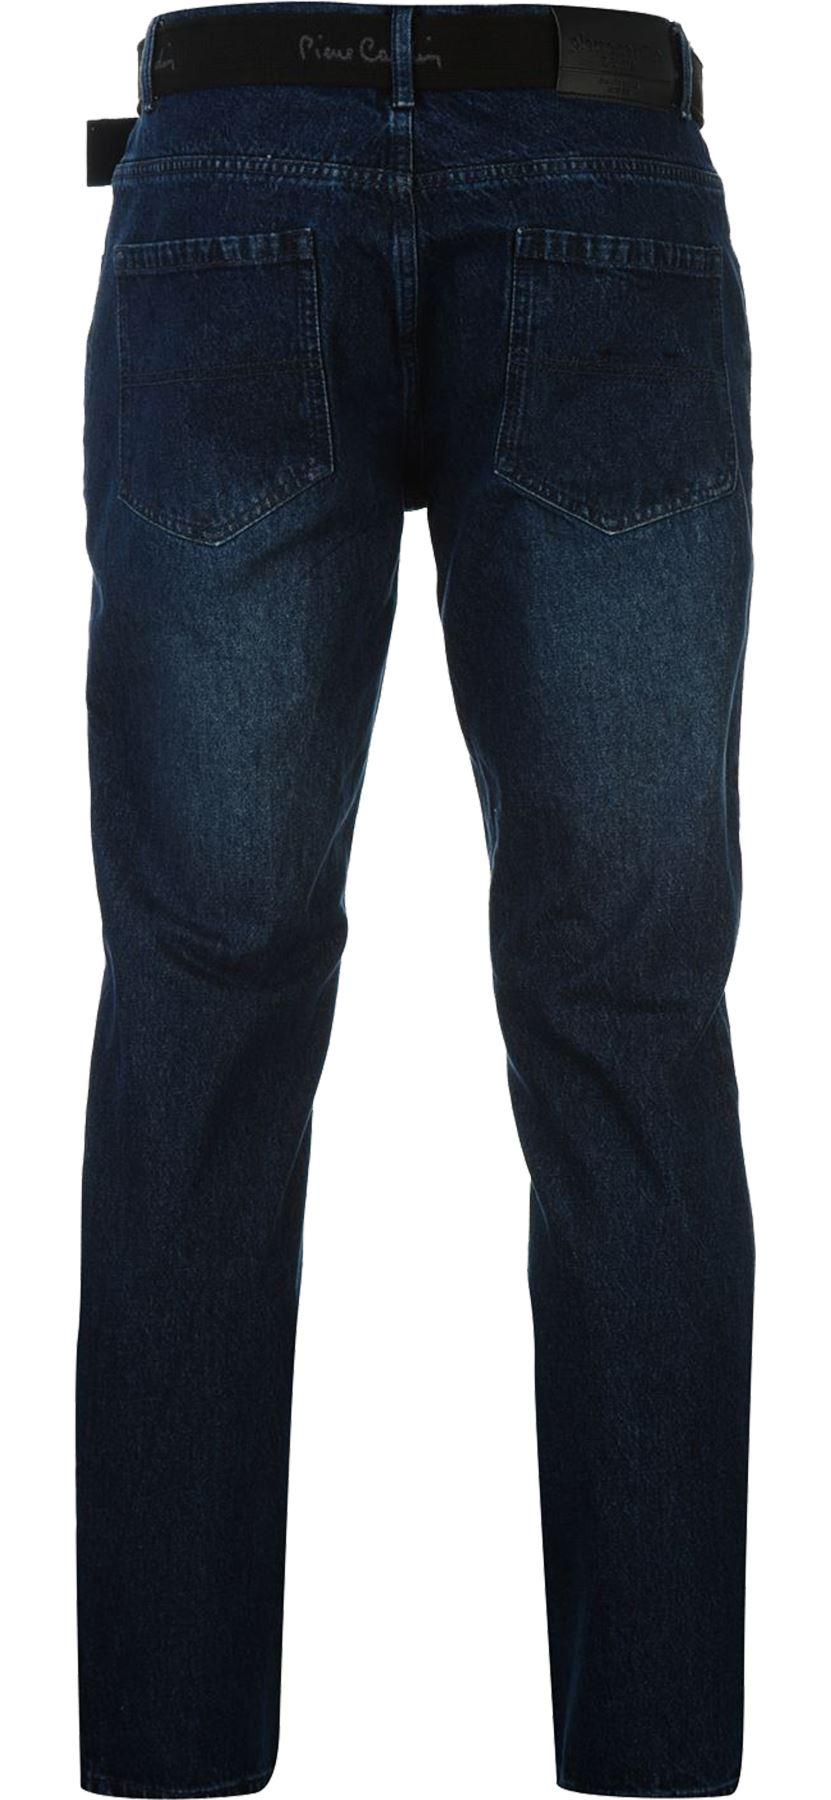 Mens-Belted-Denim-Jeans-Straight-Leg-Regular-Fit-Pierre-Cardin-Pants-Big-Tall thumbnail 16